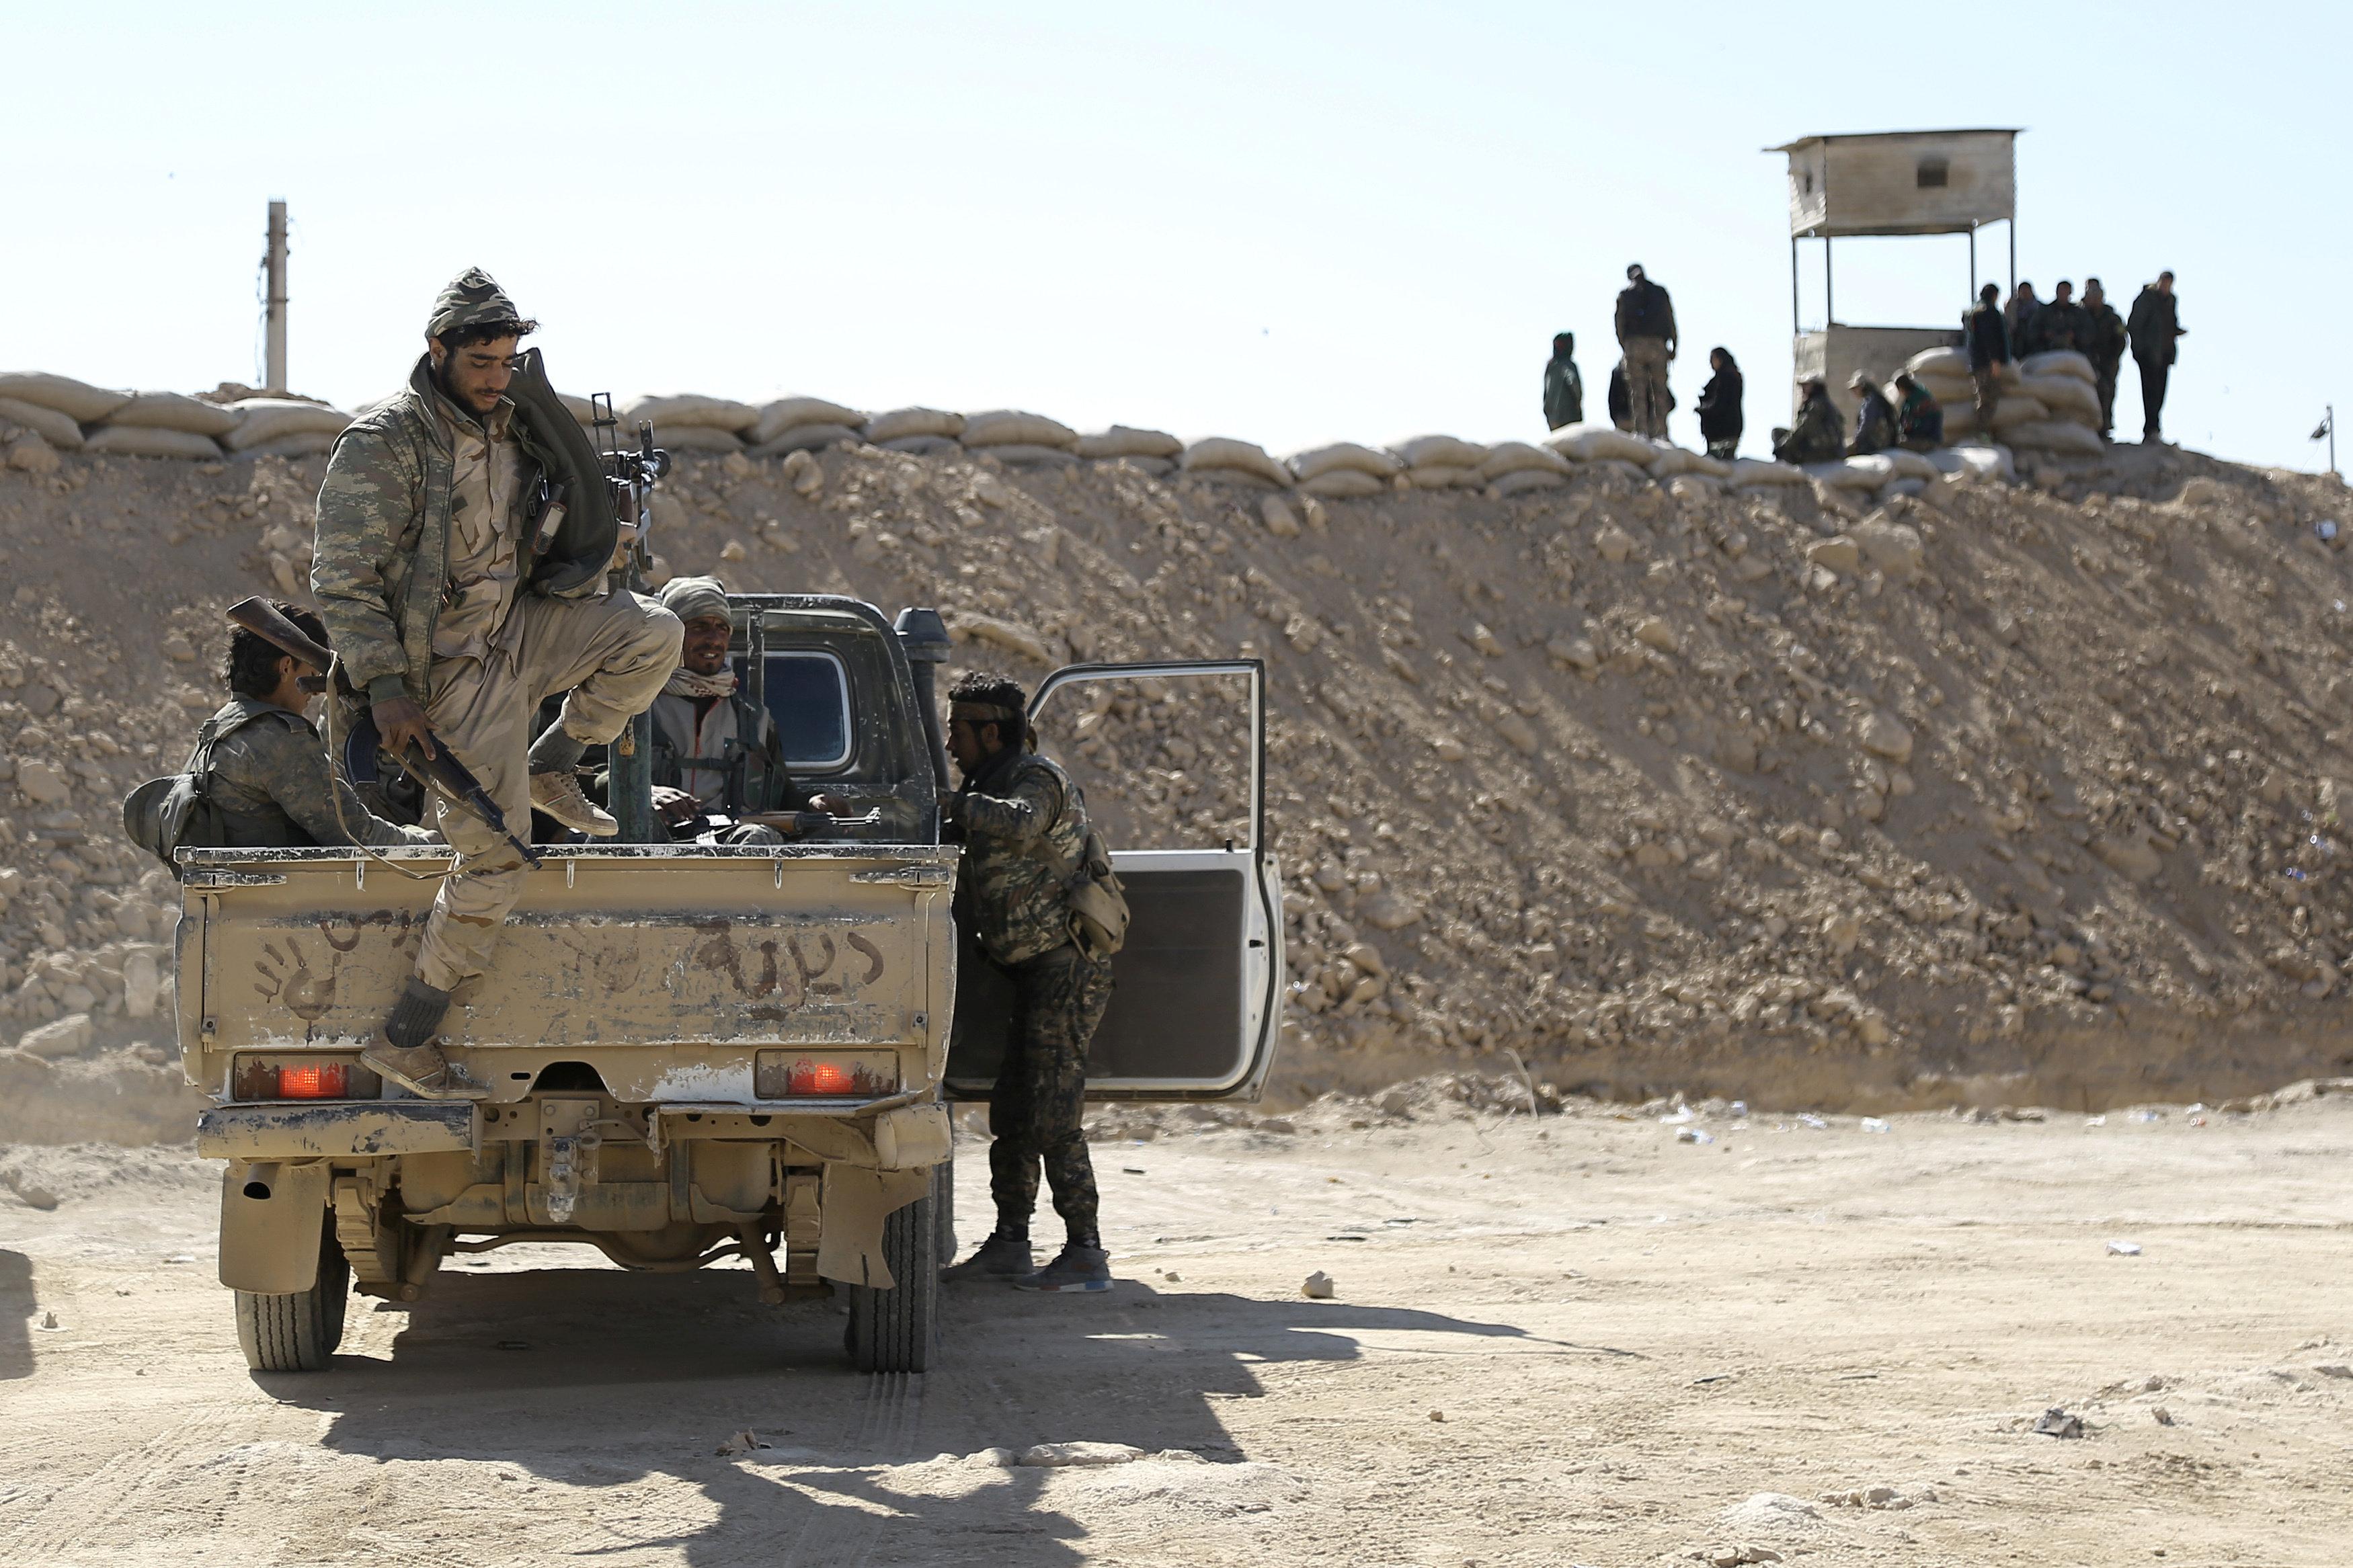 Car Bomb Blast Kills Dozens At Security Checkpoint In